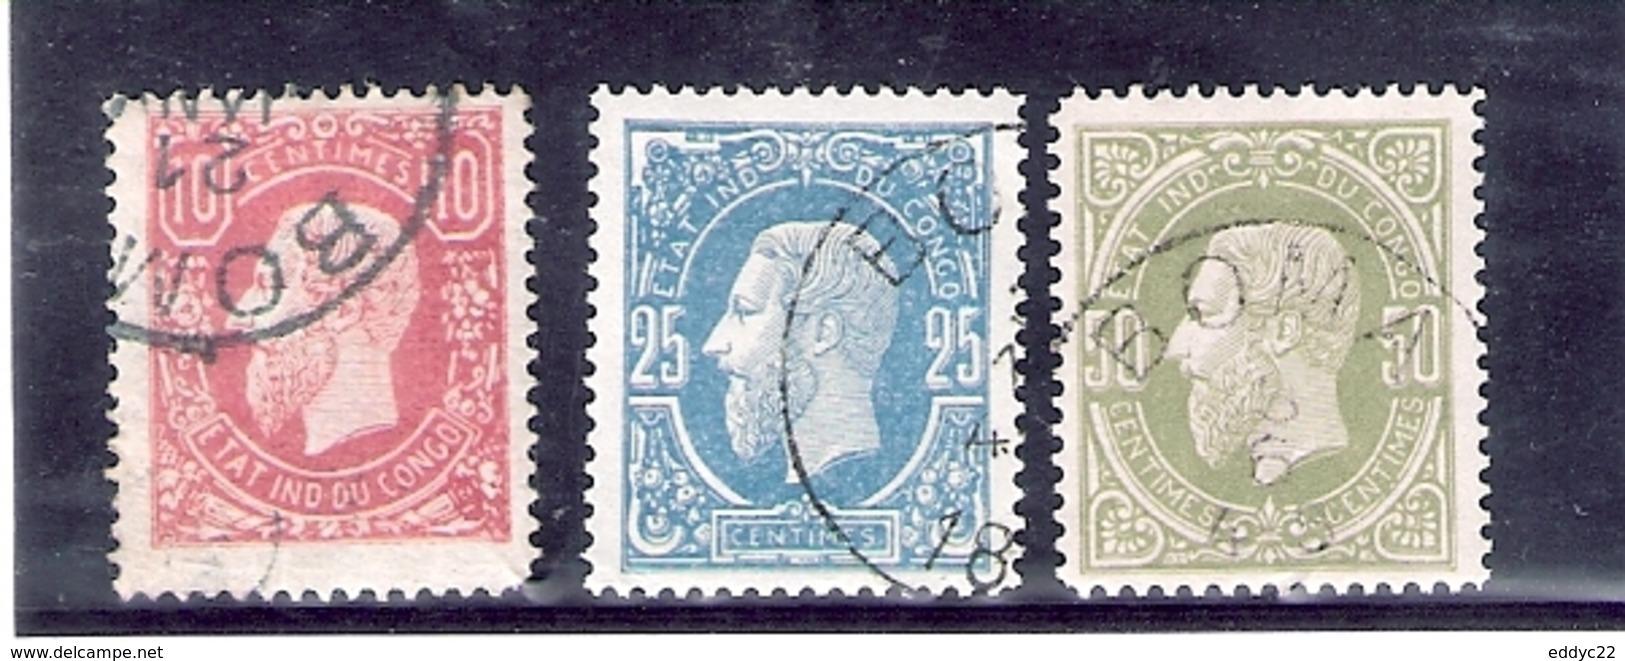 Congo Belge - 2-3-4 - Obl/gest/used - 1884-1894 Precursors & Leopold II